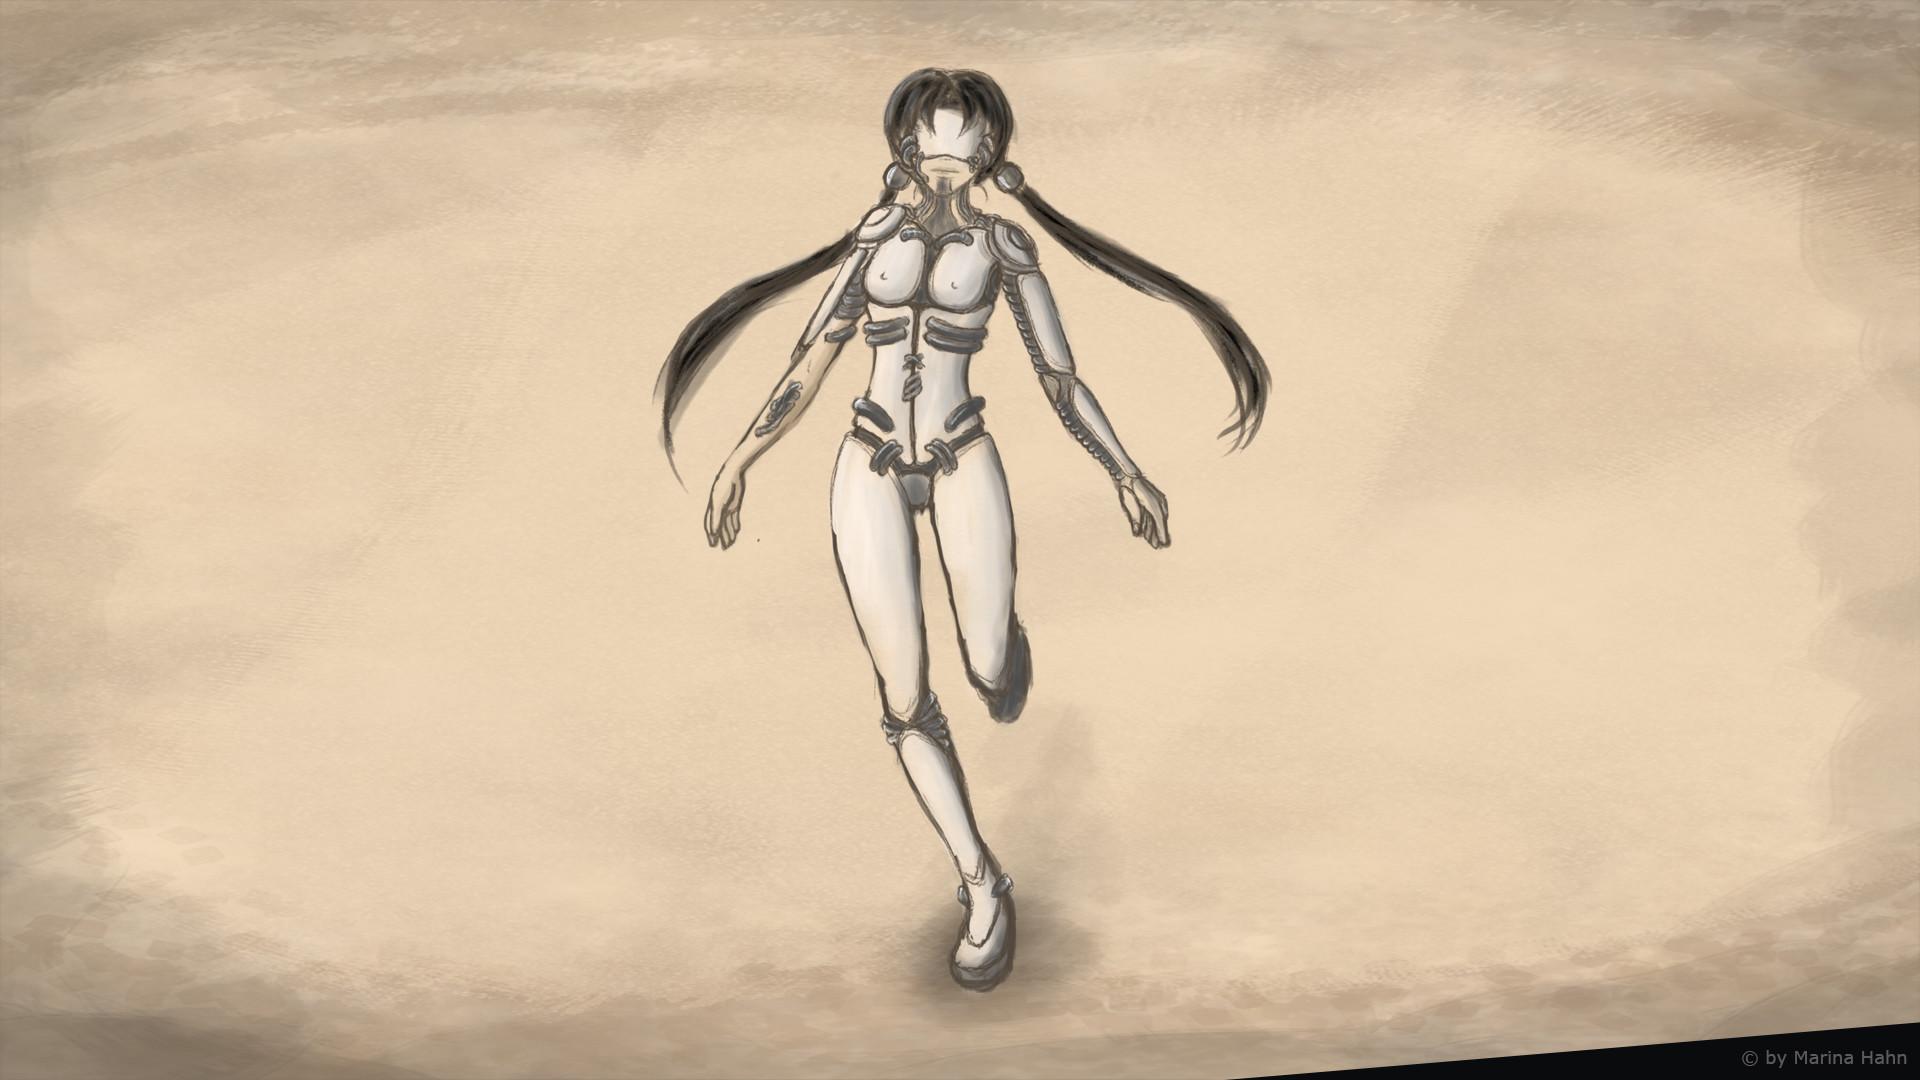 Marina hahn character3d cyborgconcept